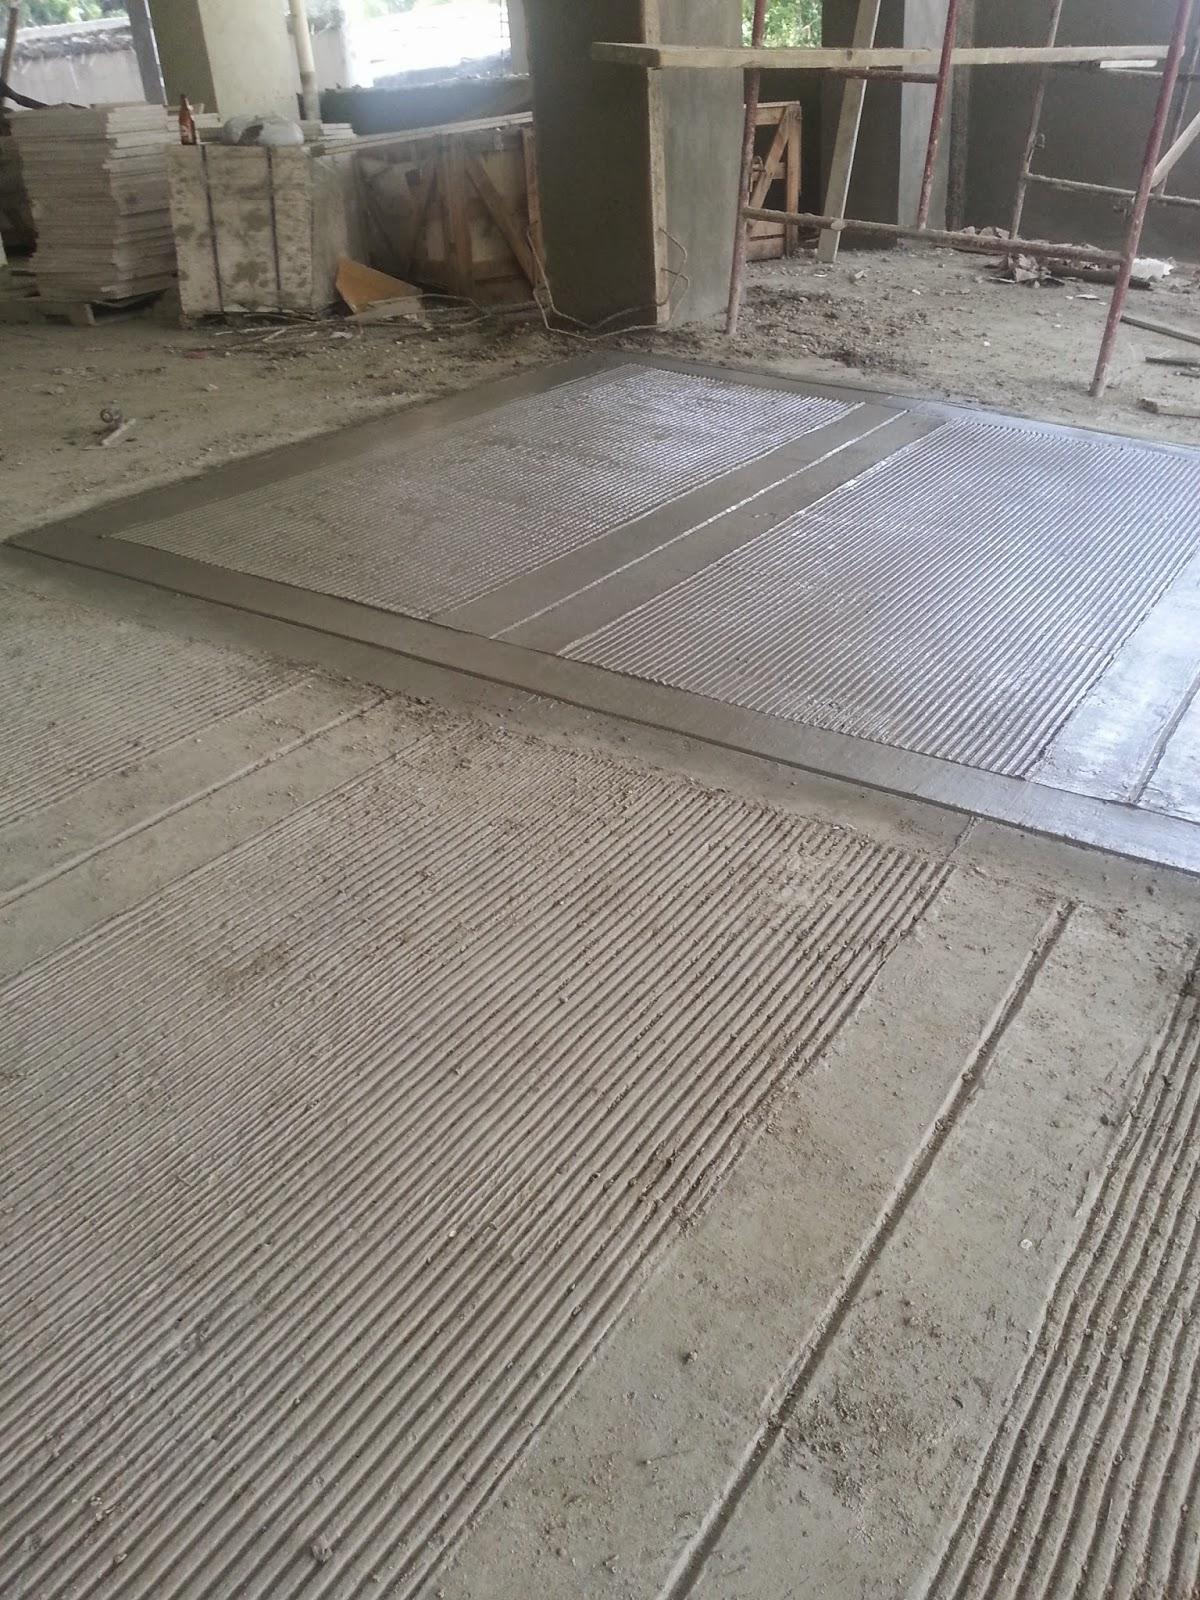 Quarq pisos de concreto en rallado profundo tendencias - Cemento pulido exterior ...